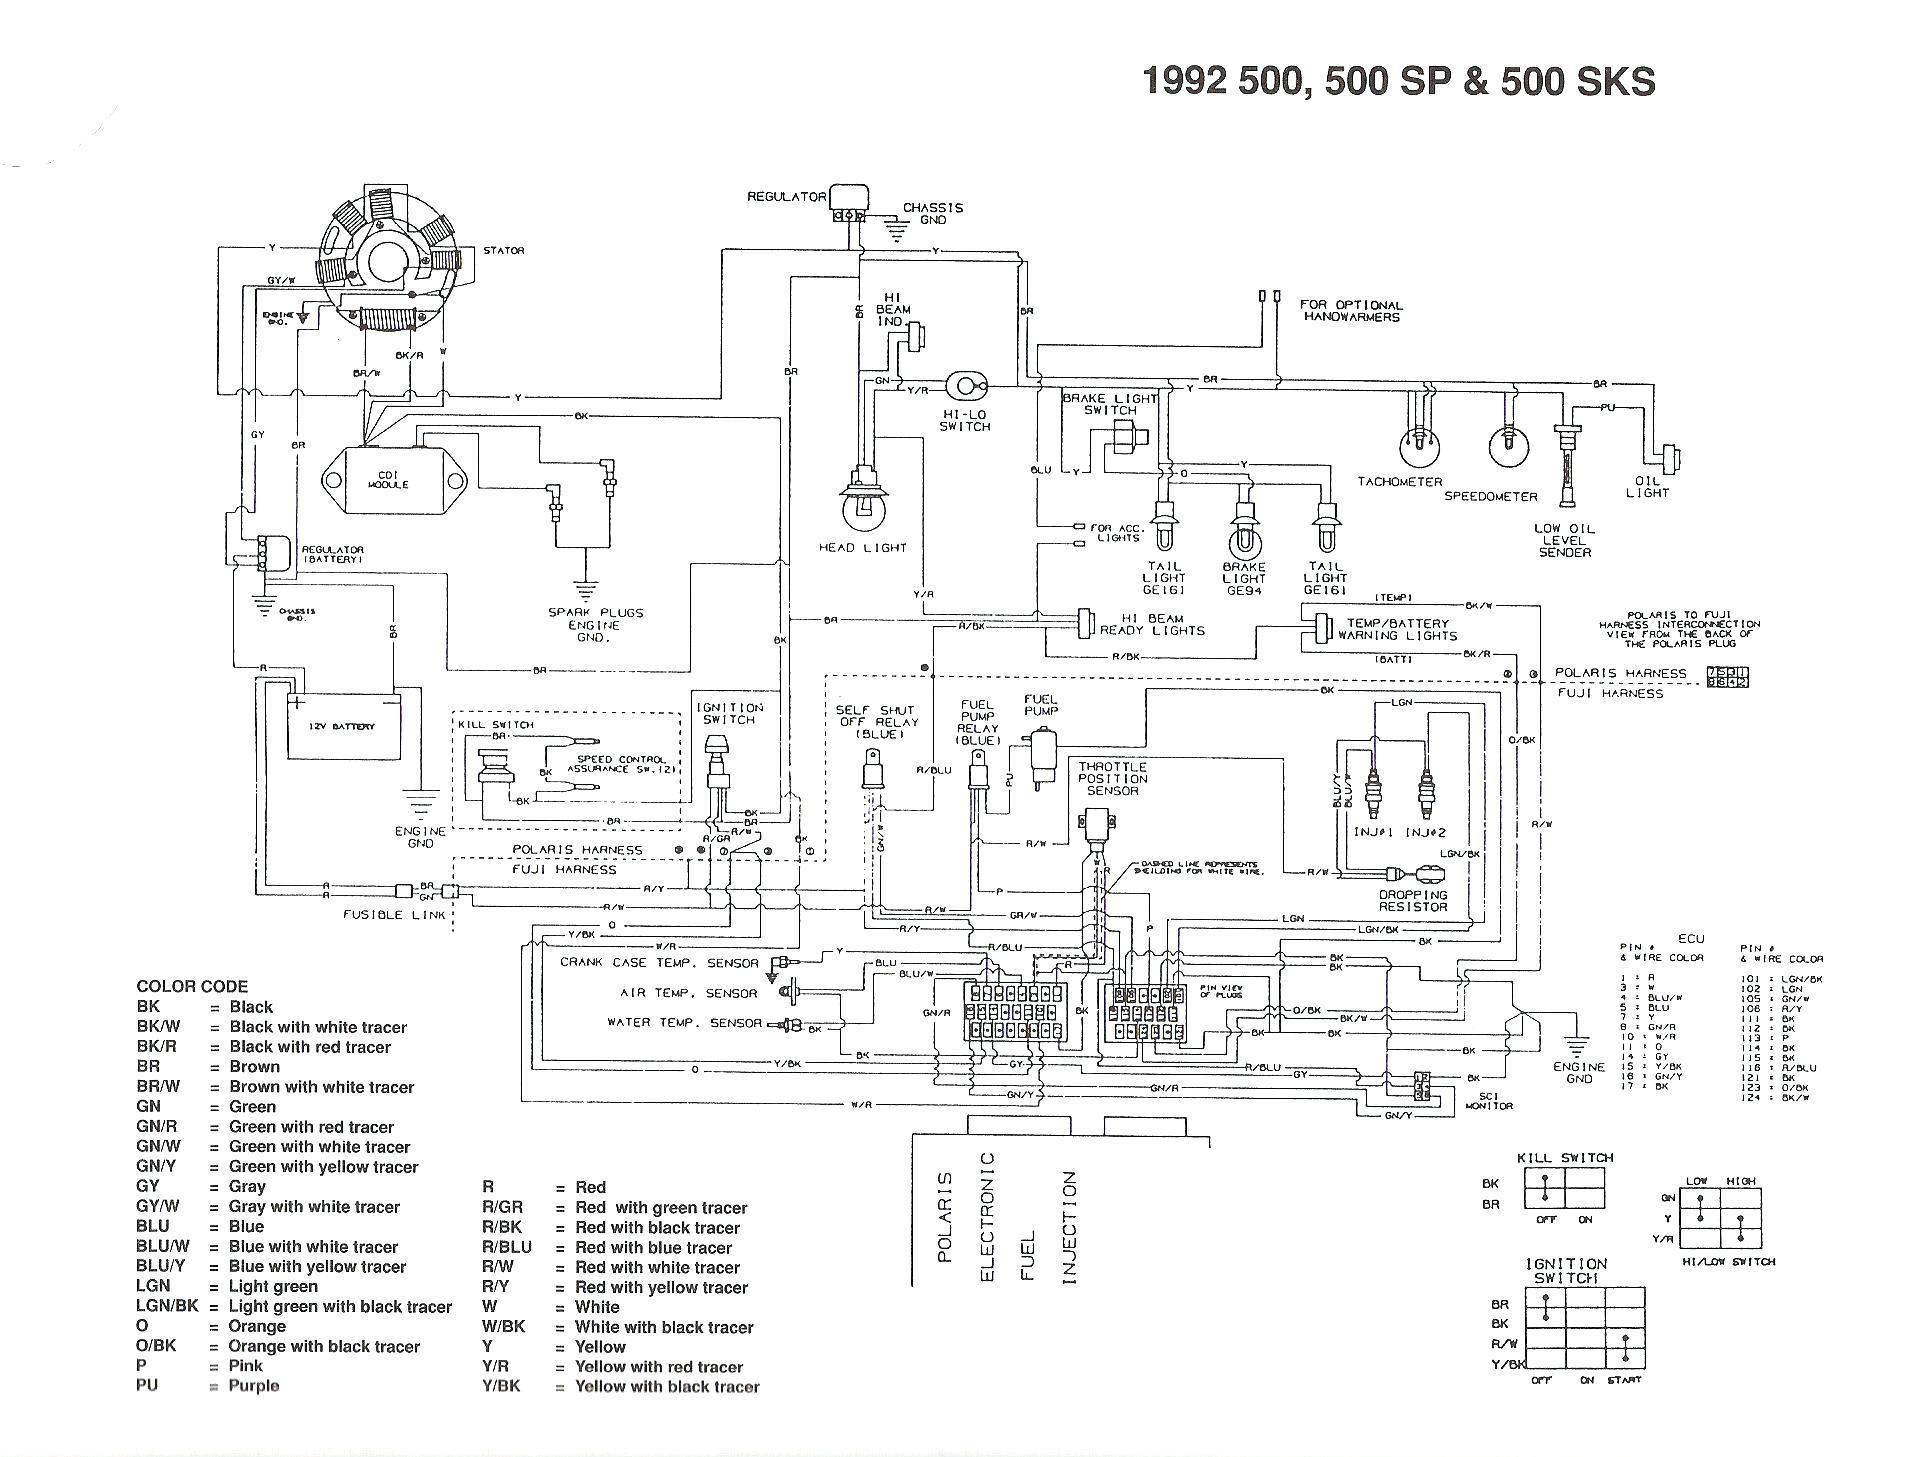 [DIAGRAM_34OR]  GW_2878] Wireing Diagram For 03 Sportsman 500 Wiring Diagram | 1999 Polaris Snowmobile Wiring Diagrams |  | Rosz Loskopri Stic Licuk Favo Mohammedshrine Librar Wiring 101